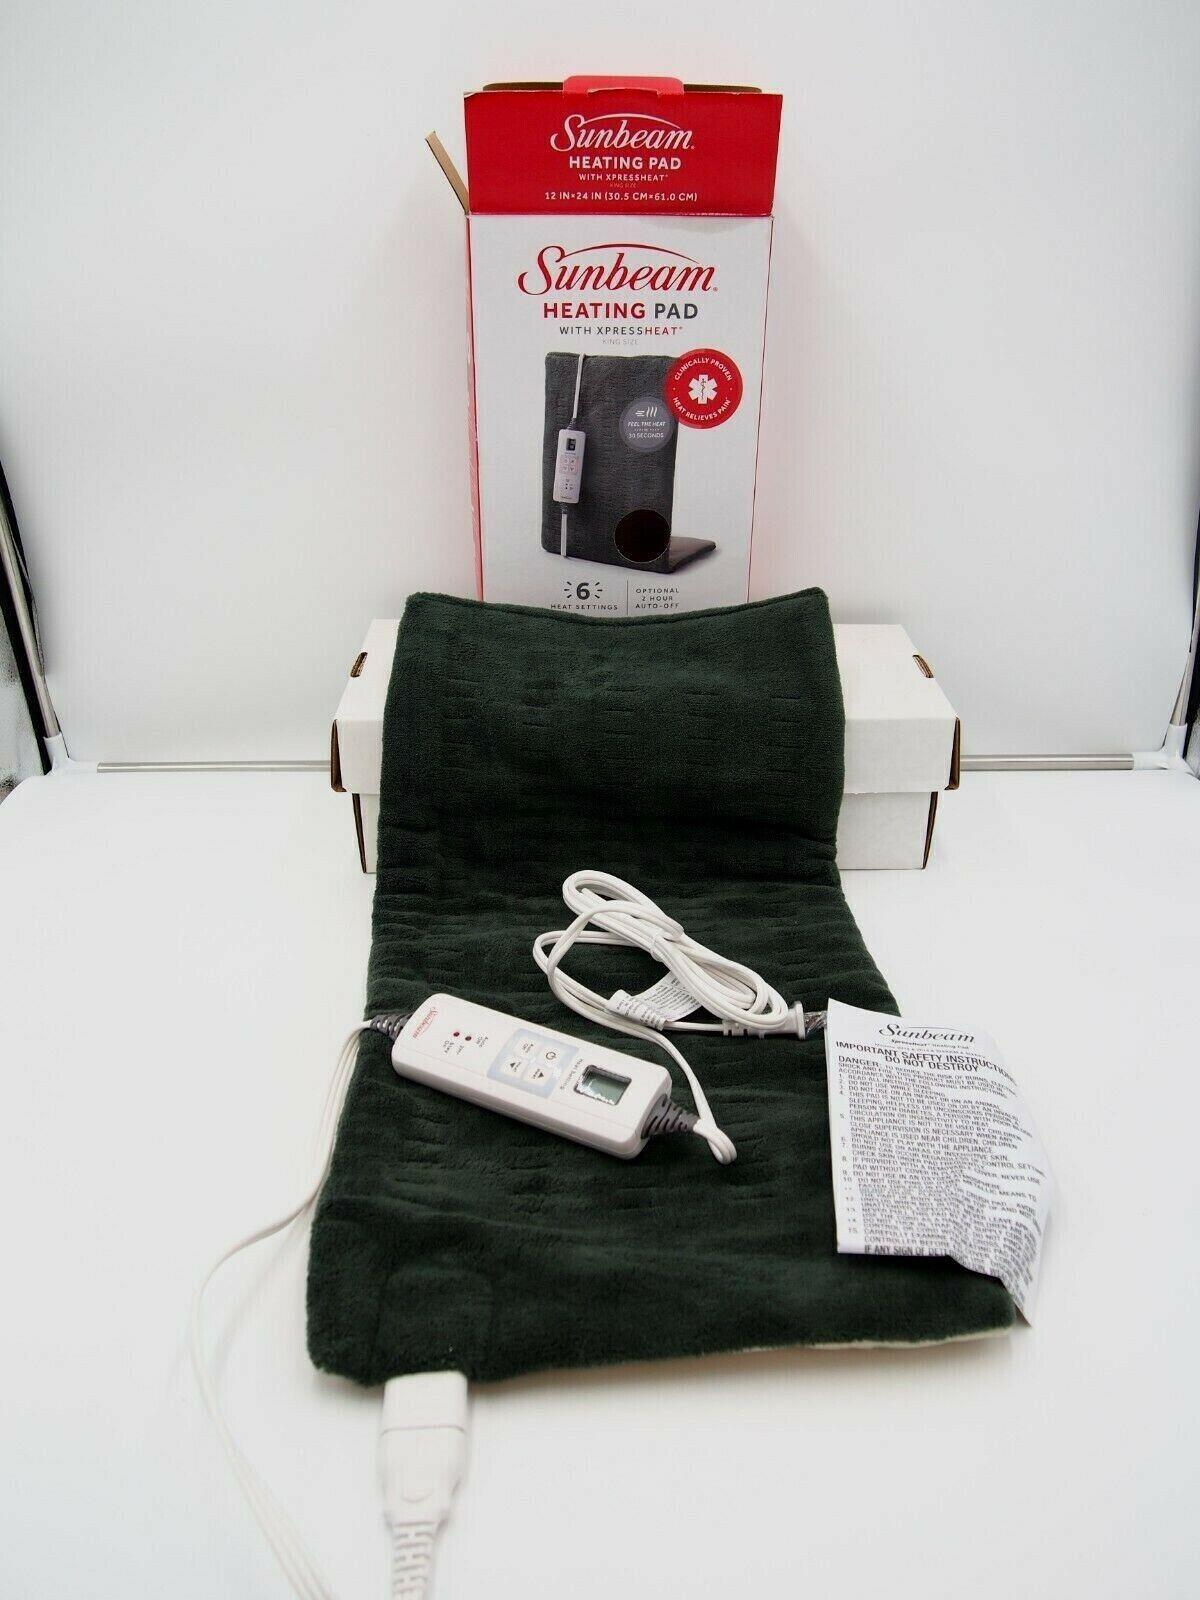 Sunbeam XpressHeat Heating Pad, King Size - Green